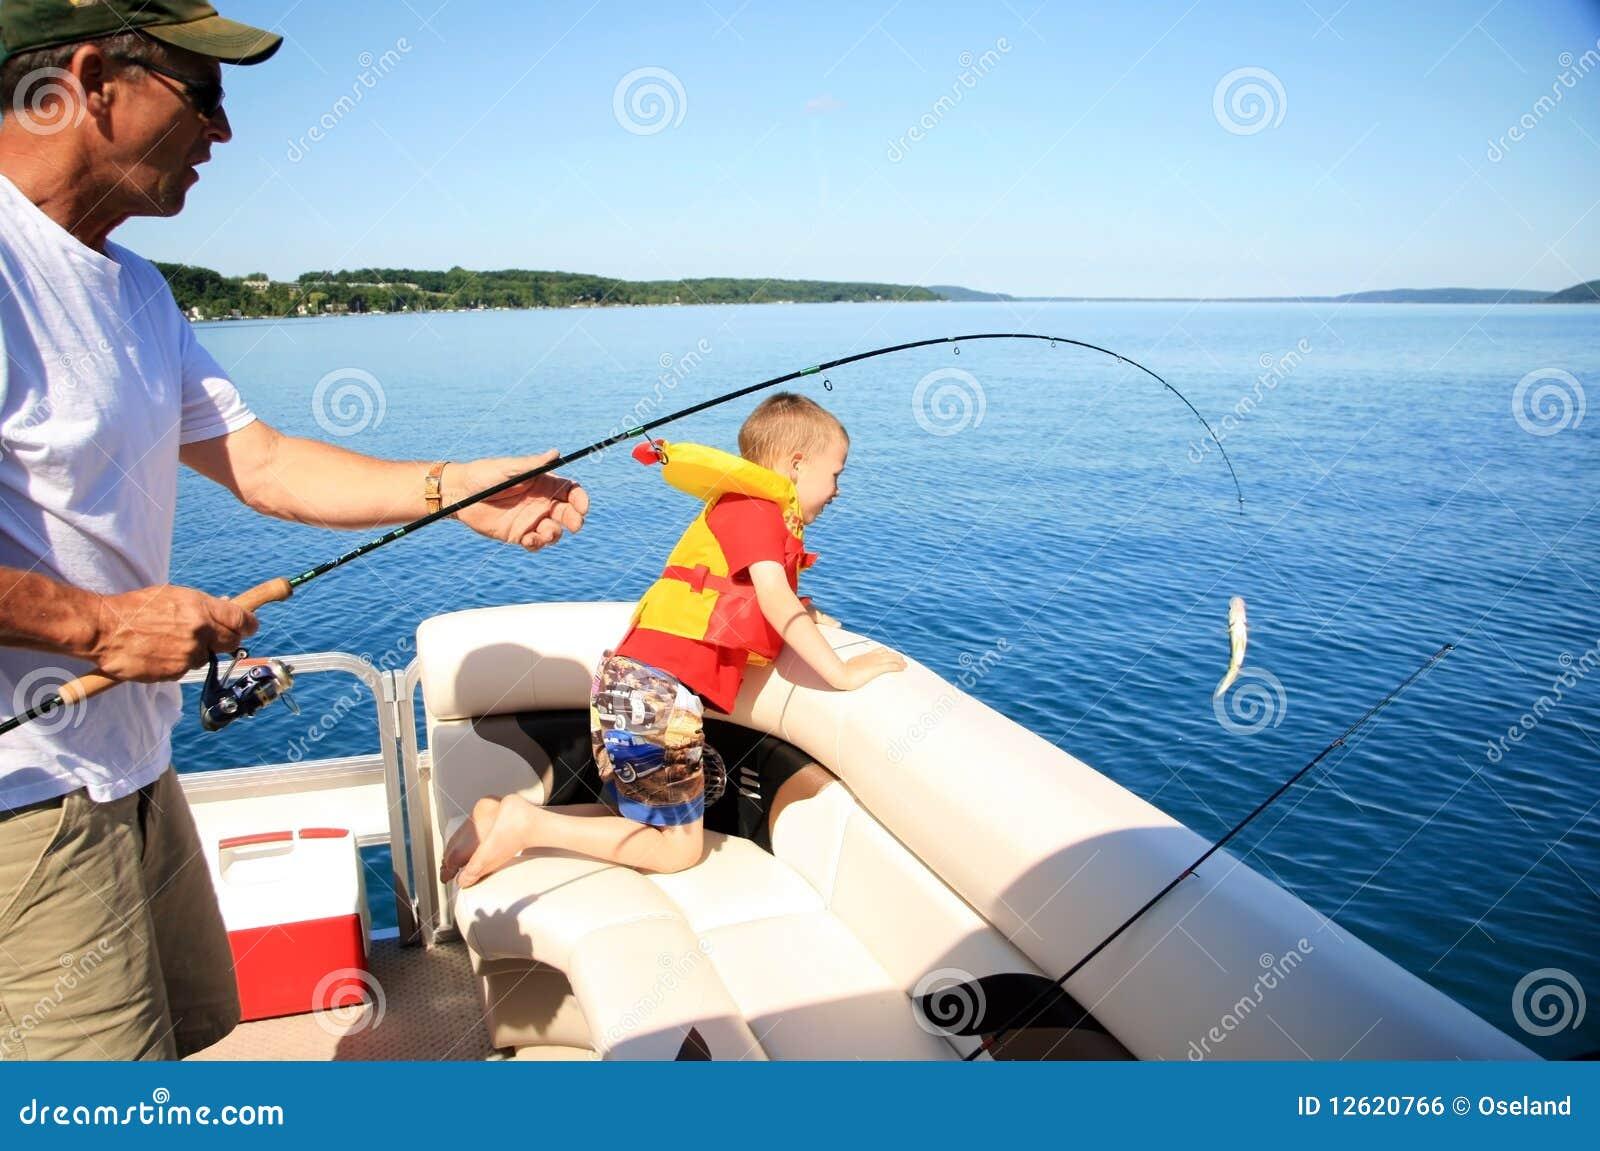 Man and Boy Fishing